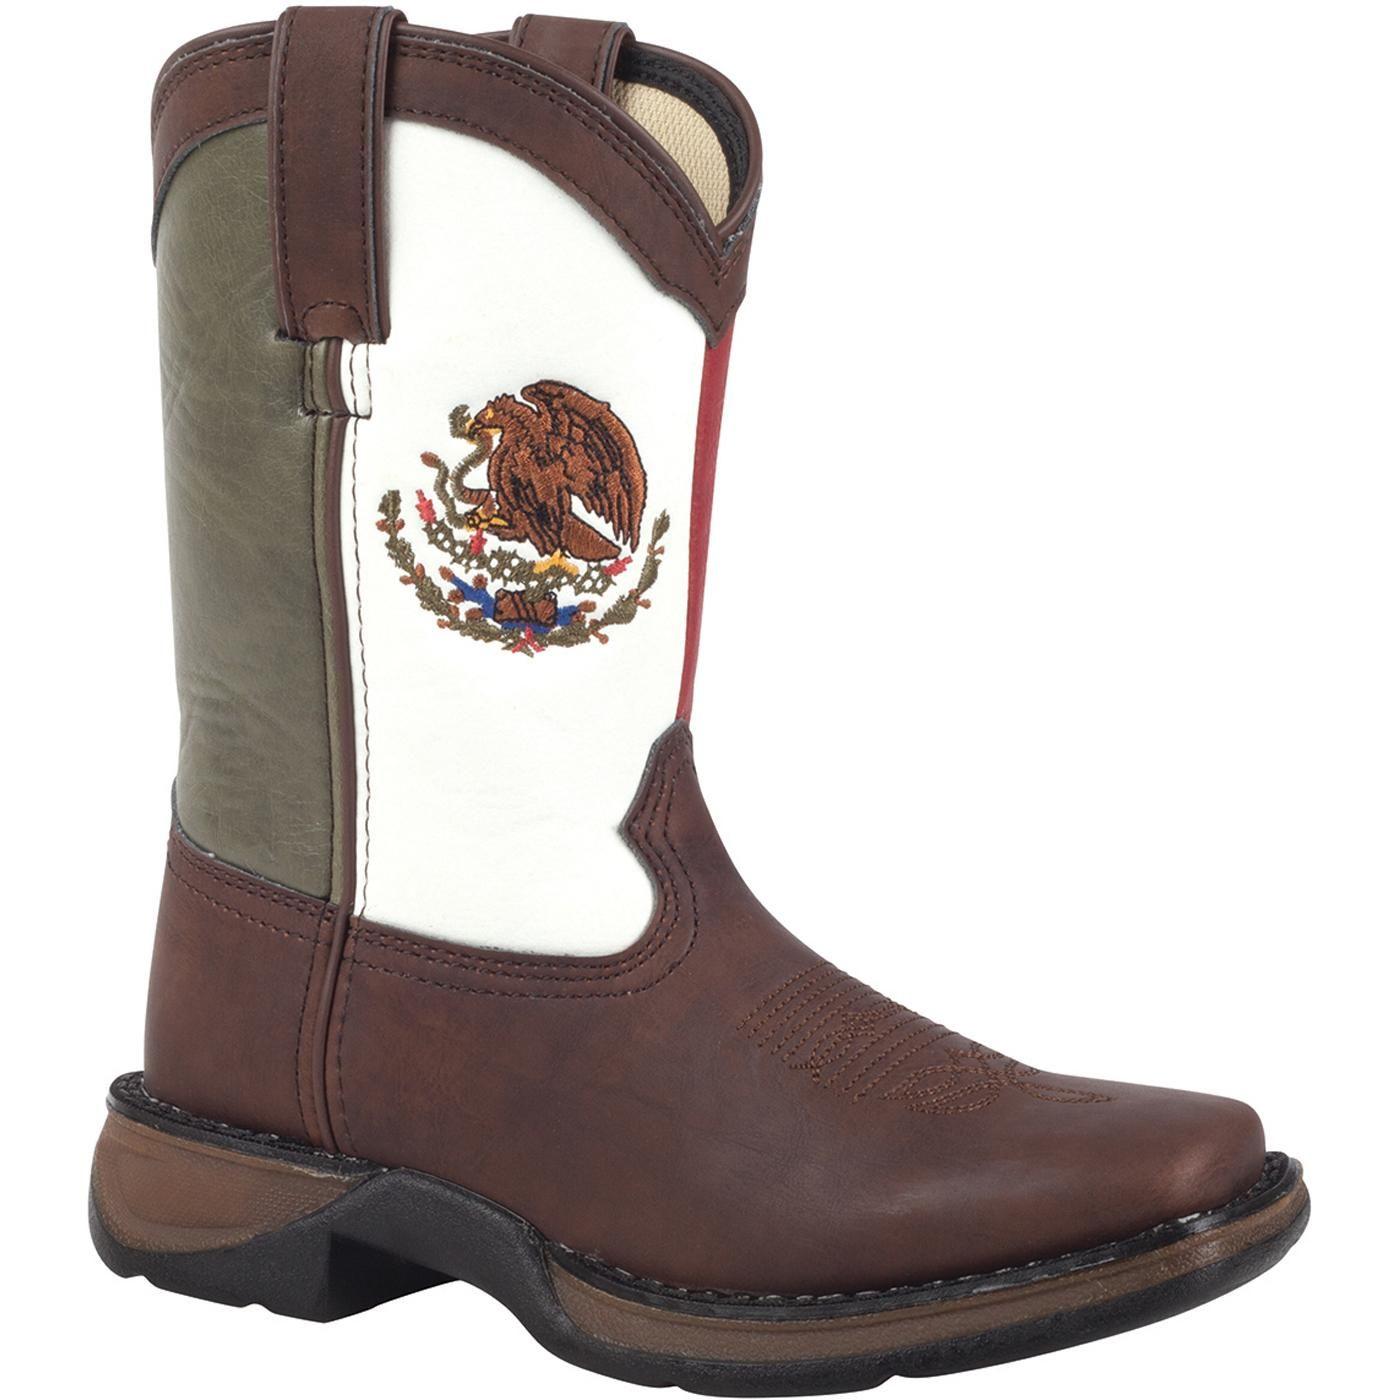 ddbd48e0203 Lil' Durango Mexican Flag Kid's Western Boots – Style #BT002 ...